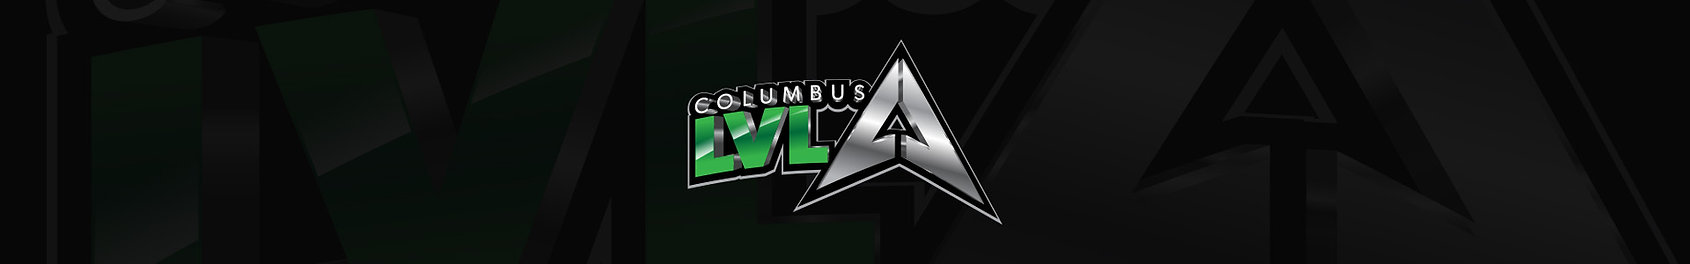 LogoBar_ColumbusLVL.jpg